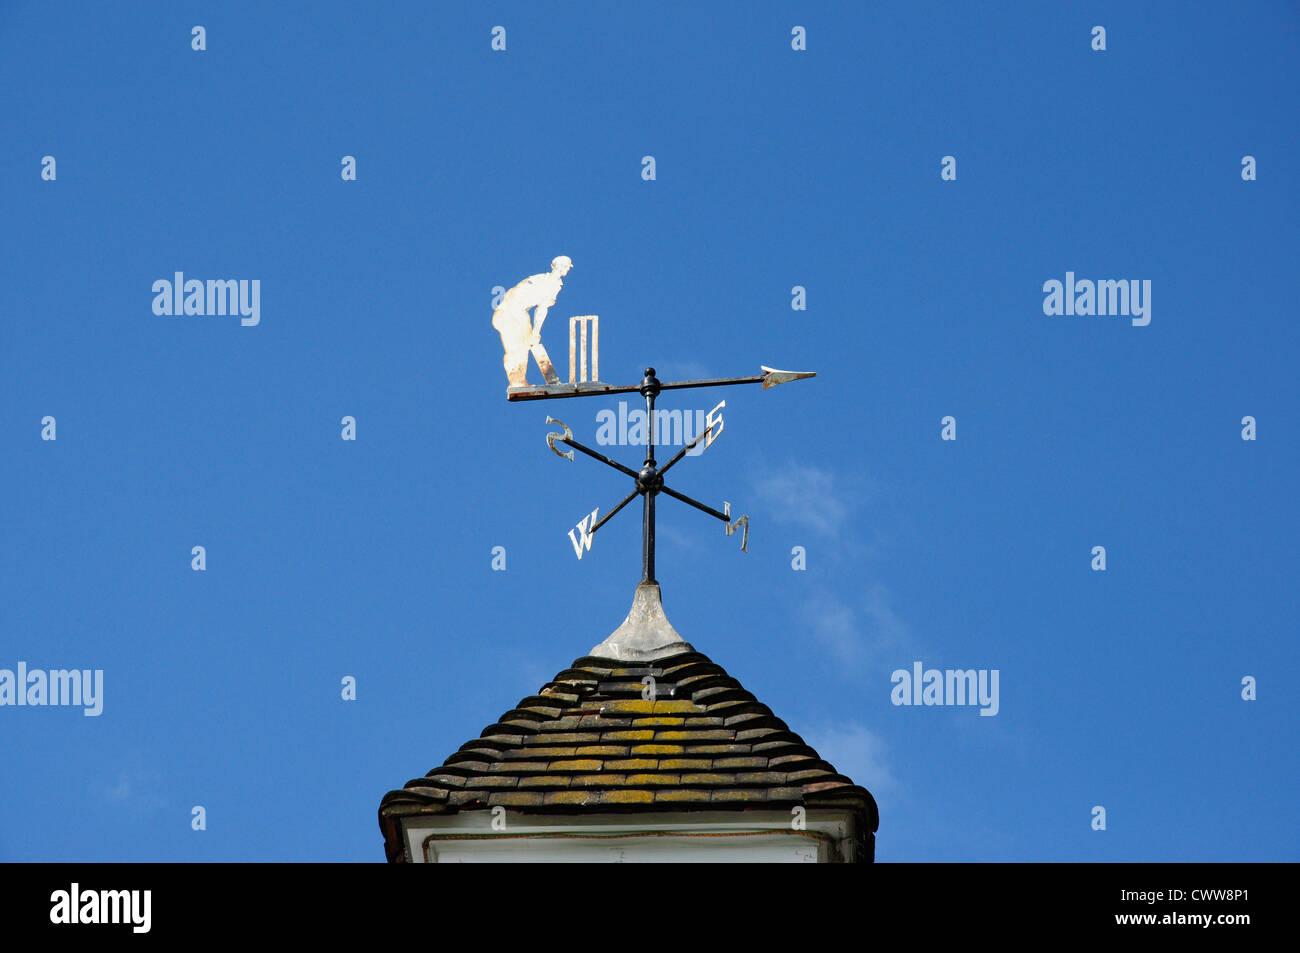 Cricketing weather vane on Hobbs' Pavilion, Parker's Piece, Cambridge, England, UK (Sir Jack Hobbs) - Stock Image